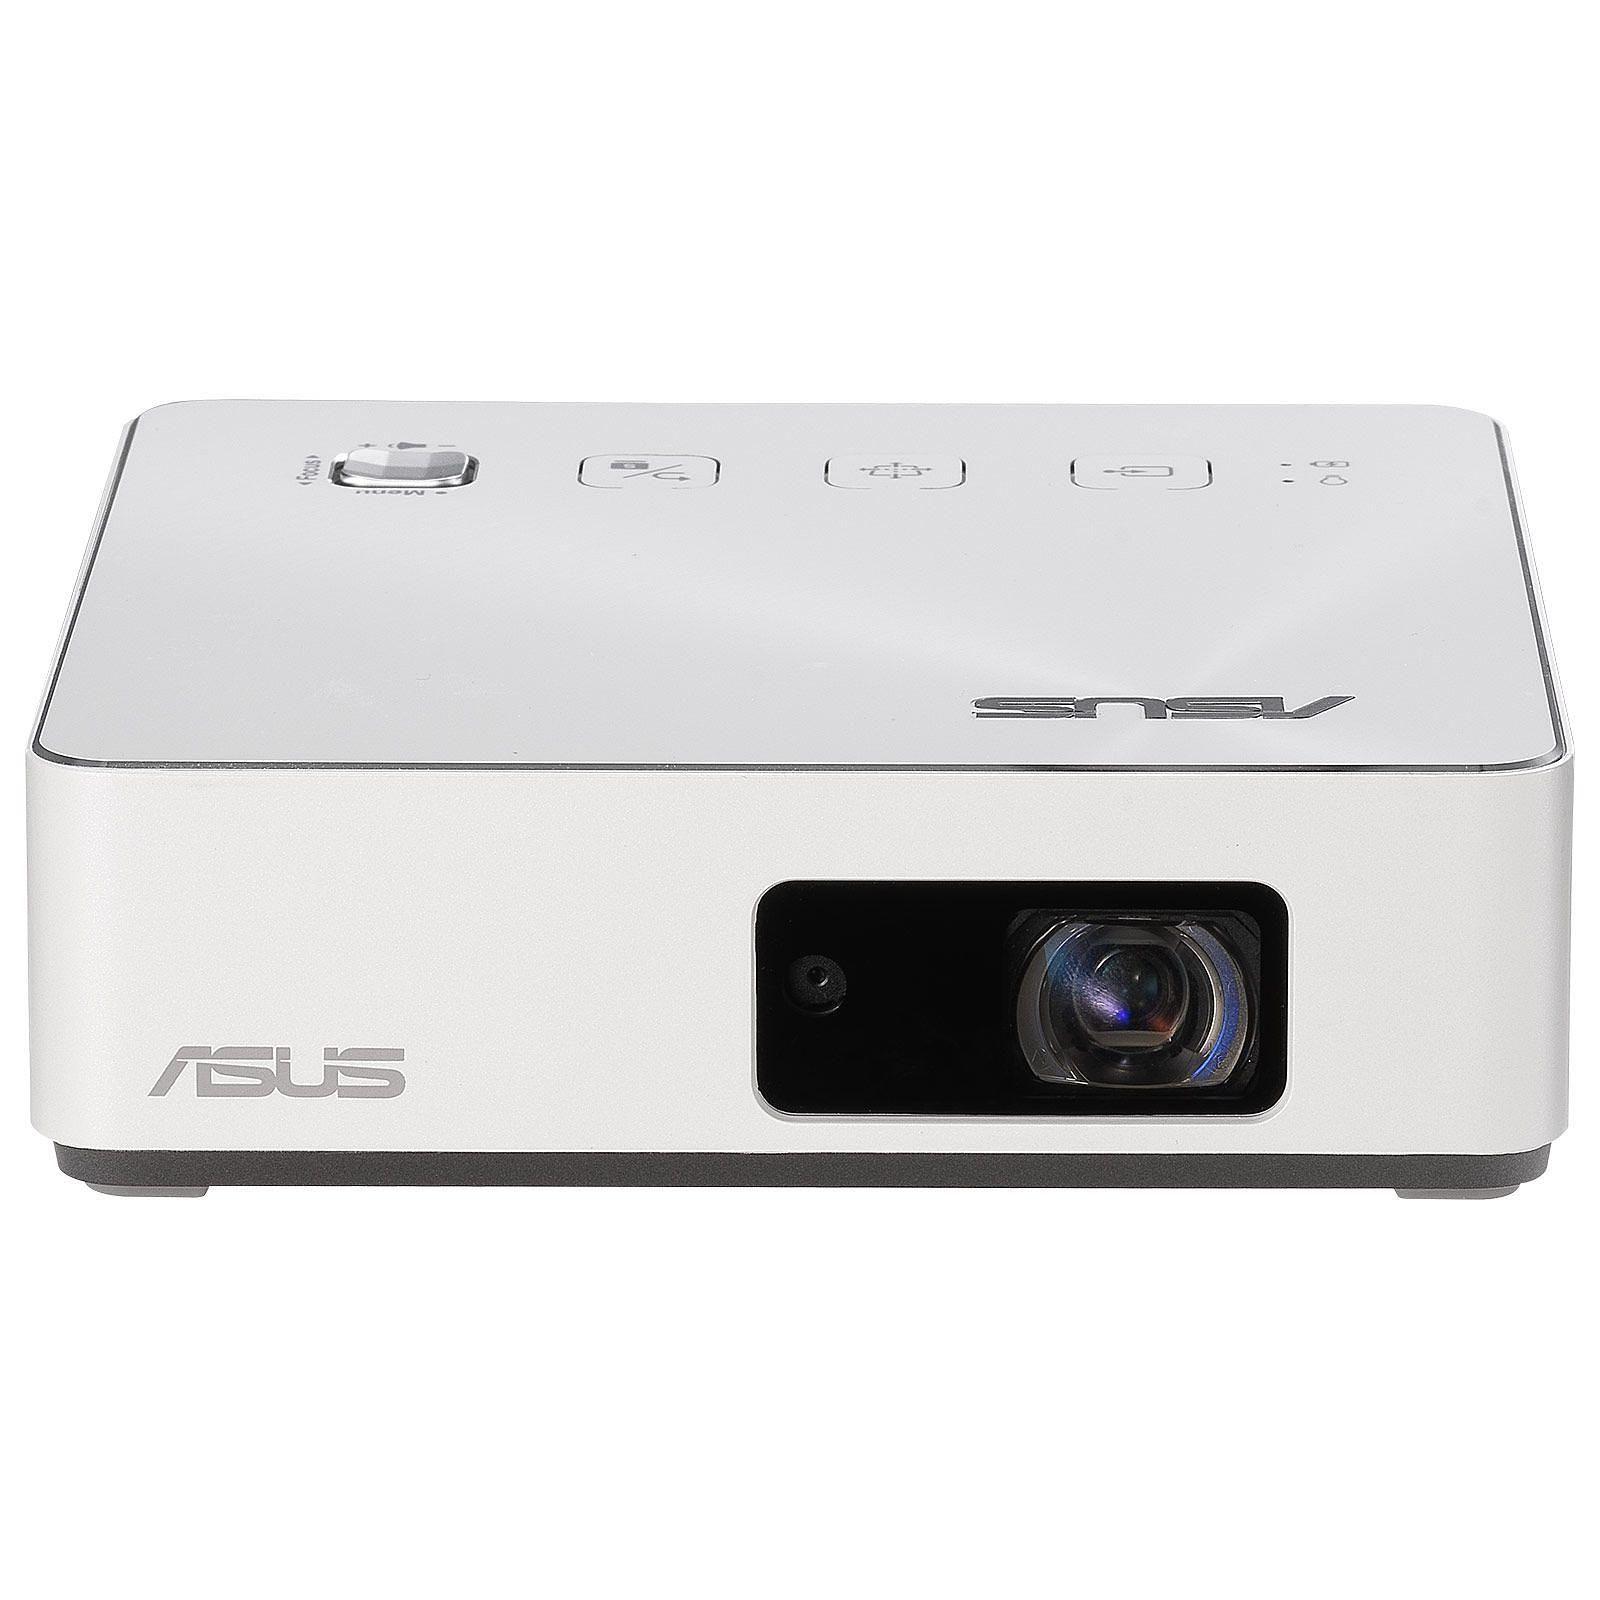 Fotografie Videoproiector ASUS S2 ZenBeam, portabil, DLP, HD 1280x720, 30.000 ore, HDMI, USB-C, alb